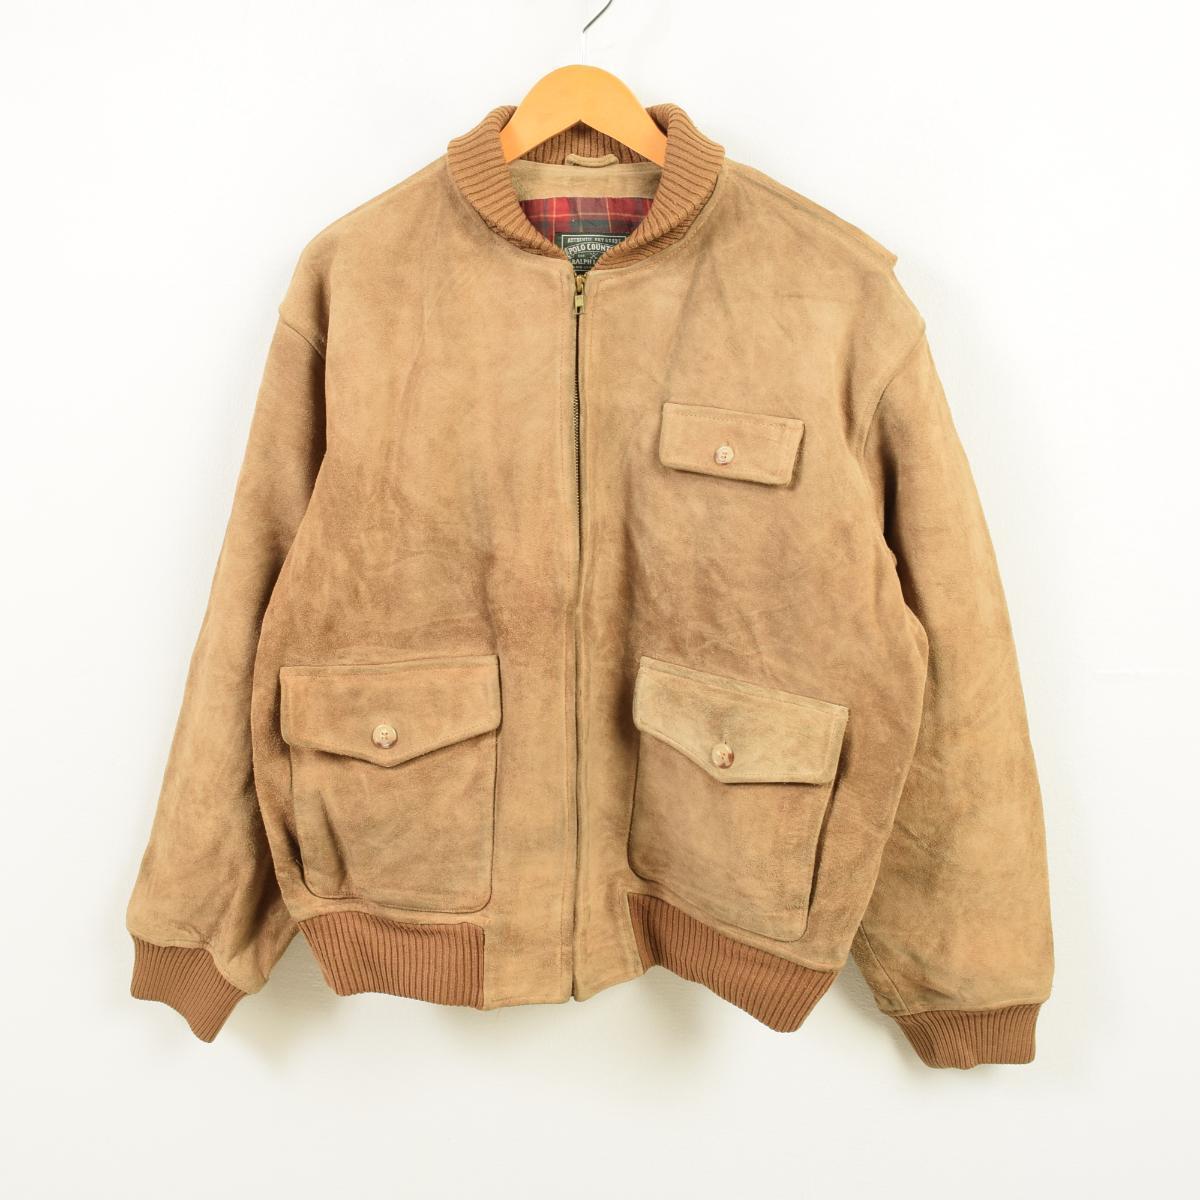 eb631c390 80-90 generation Ralph Lauren Ralph Lauren POLO COUNTRY polo country suede  leatherette jacket men ...